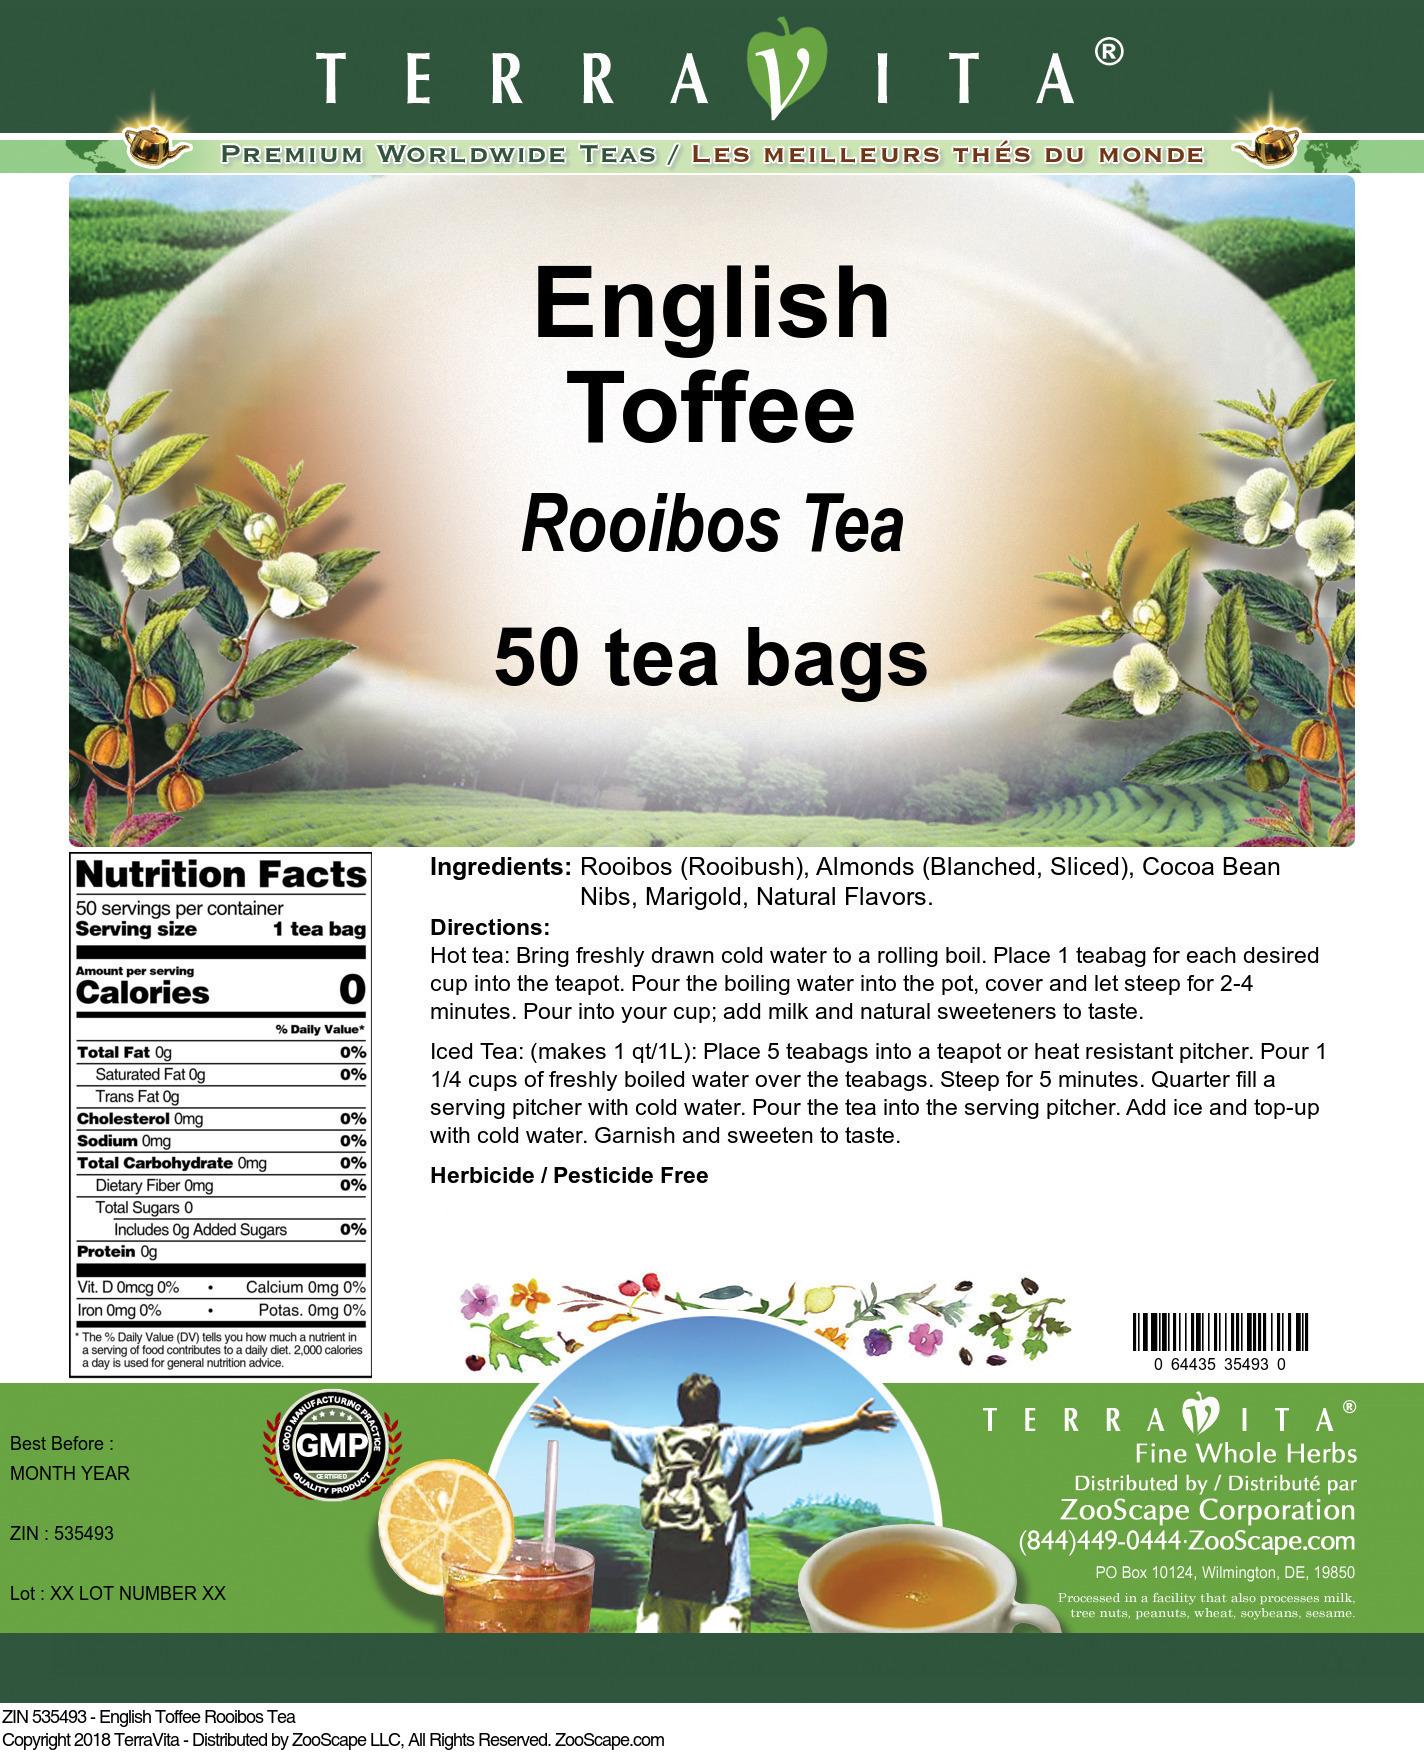 English Toffee Rooibos Tea